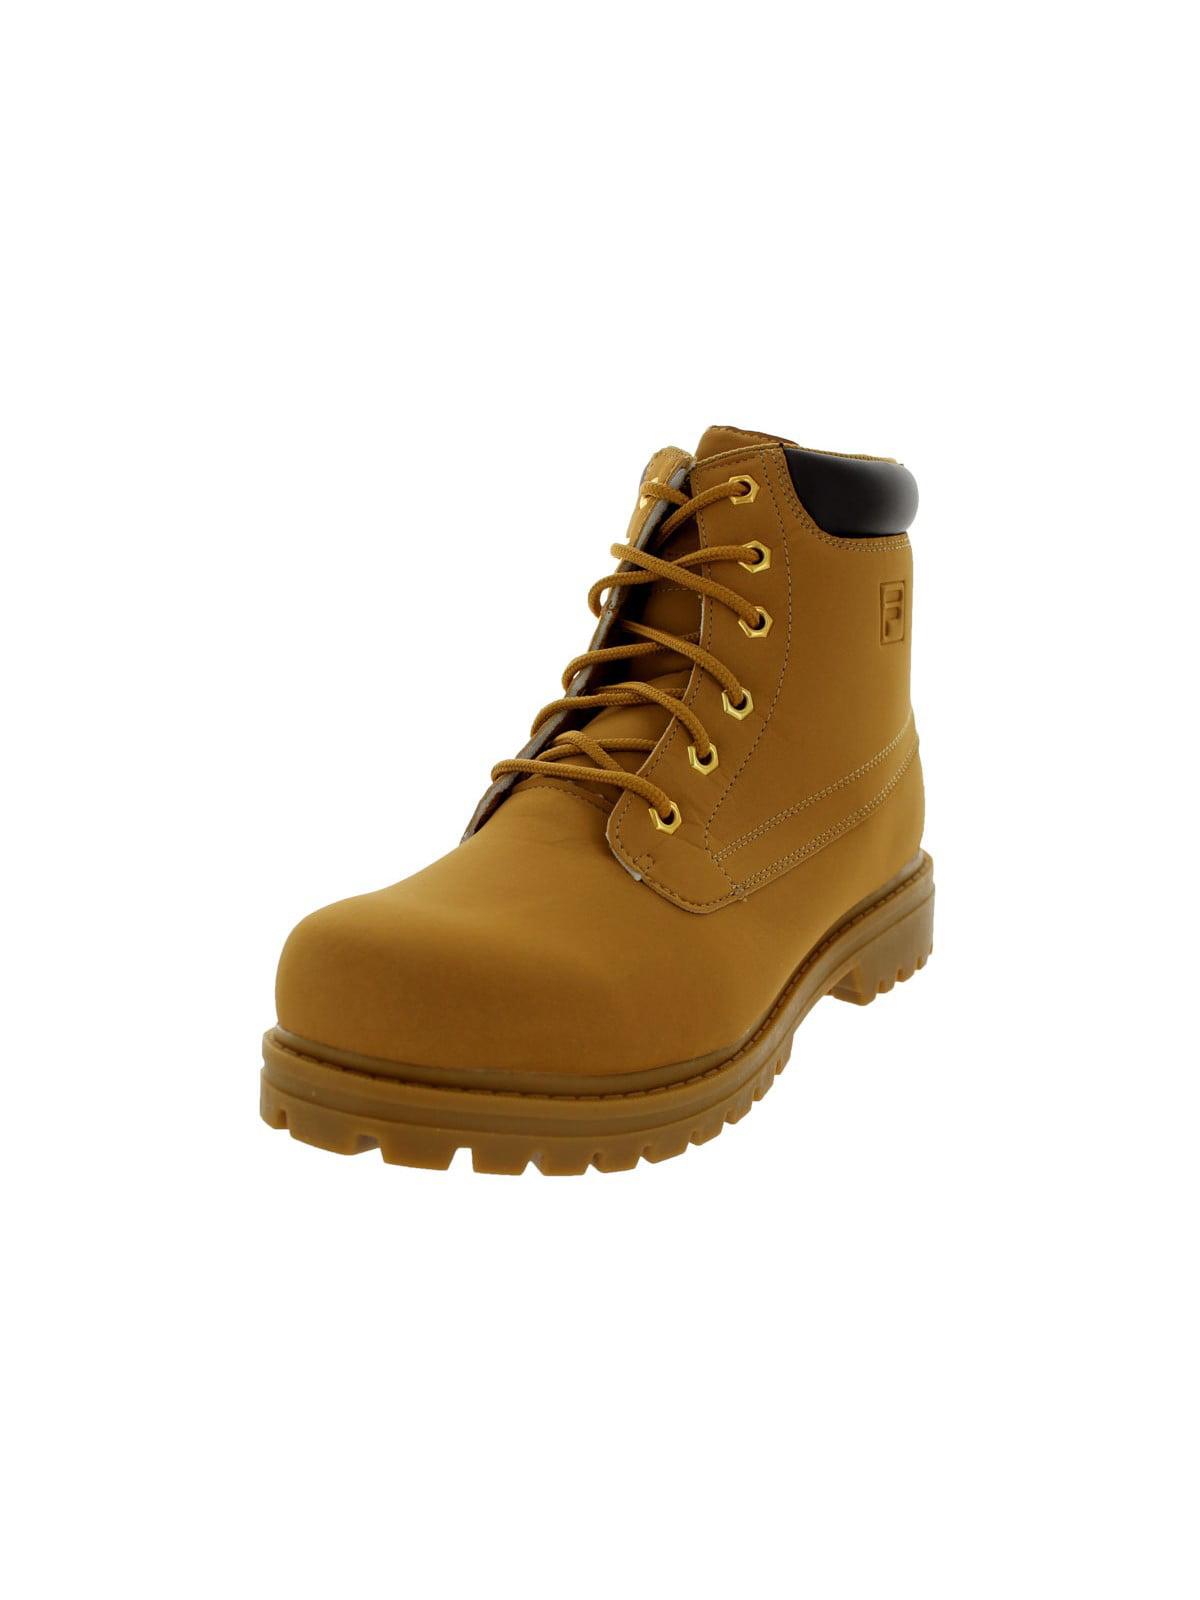 Fila 1SH40063-206 : Men's Edgewater 12 Hiking Boot Wheat Gum (12 D(M) US) by Fila